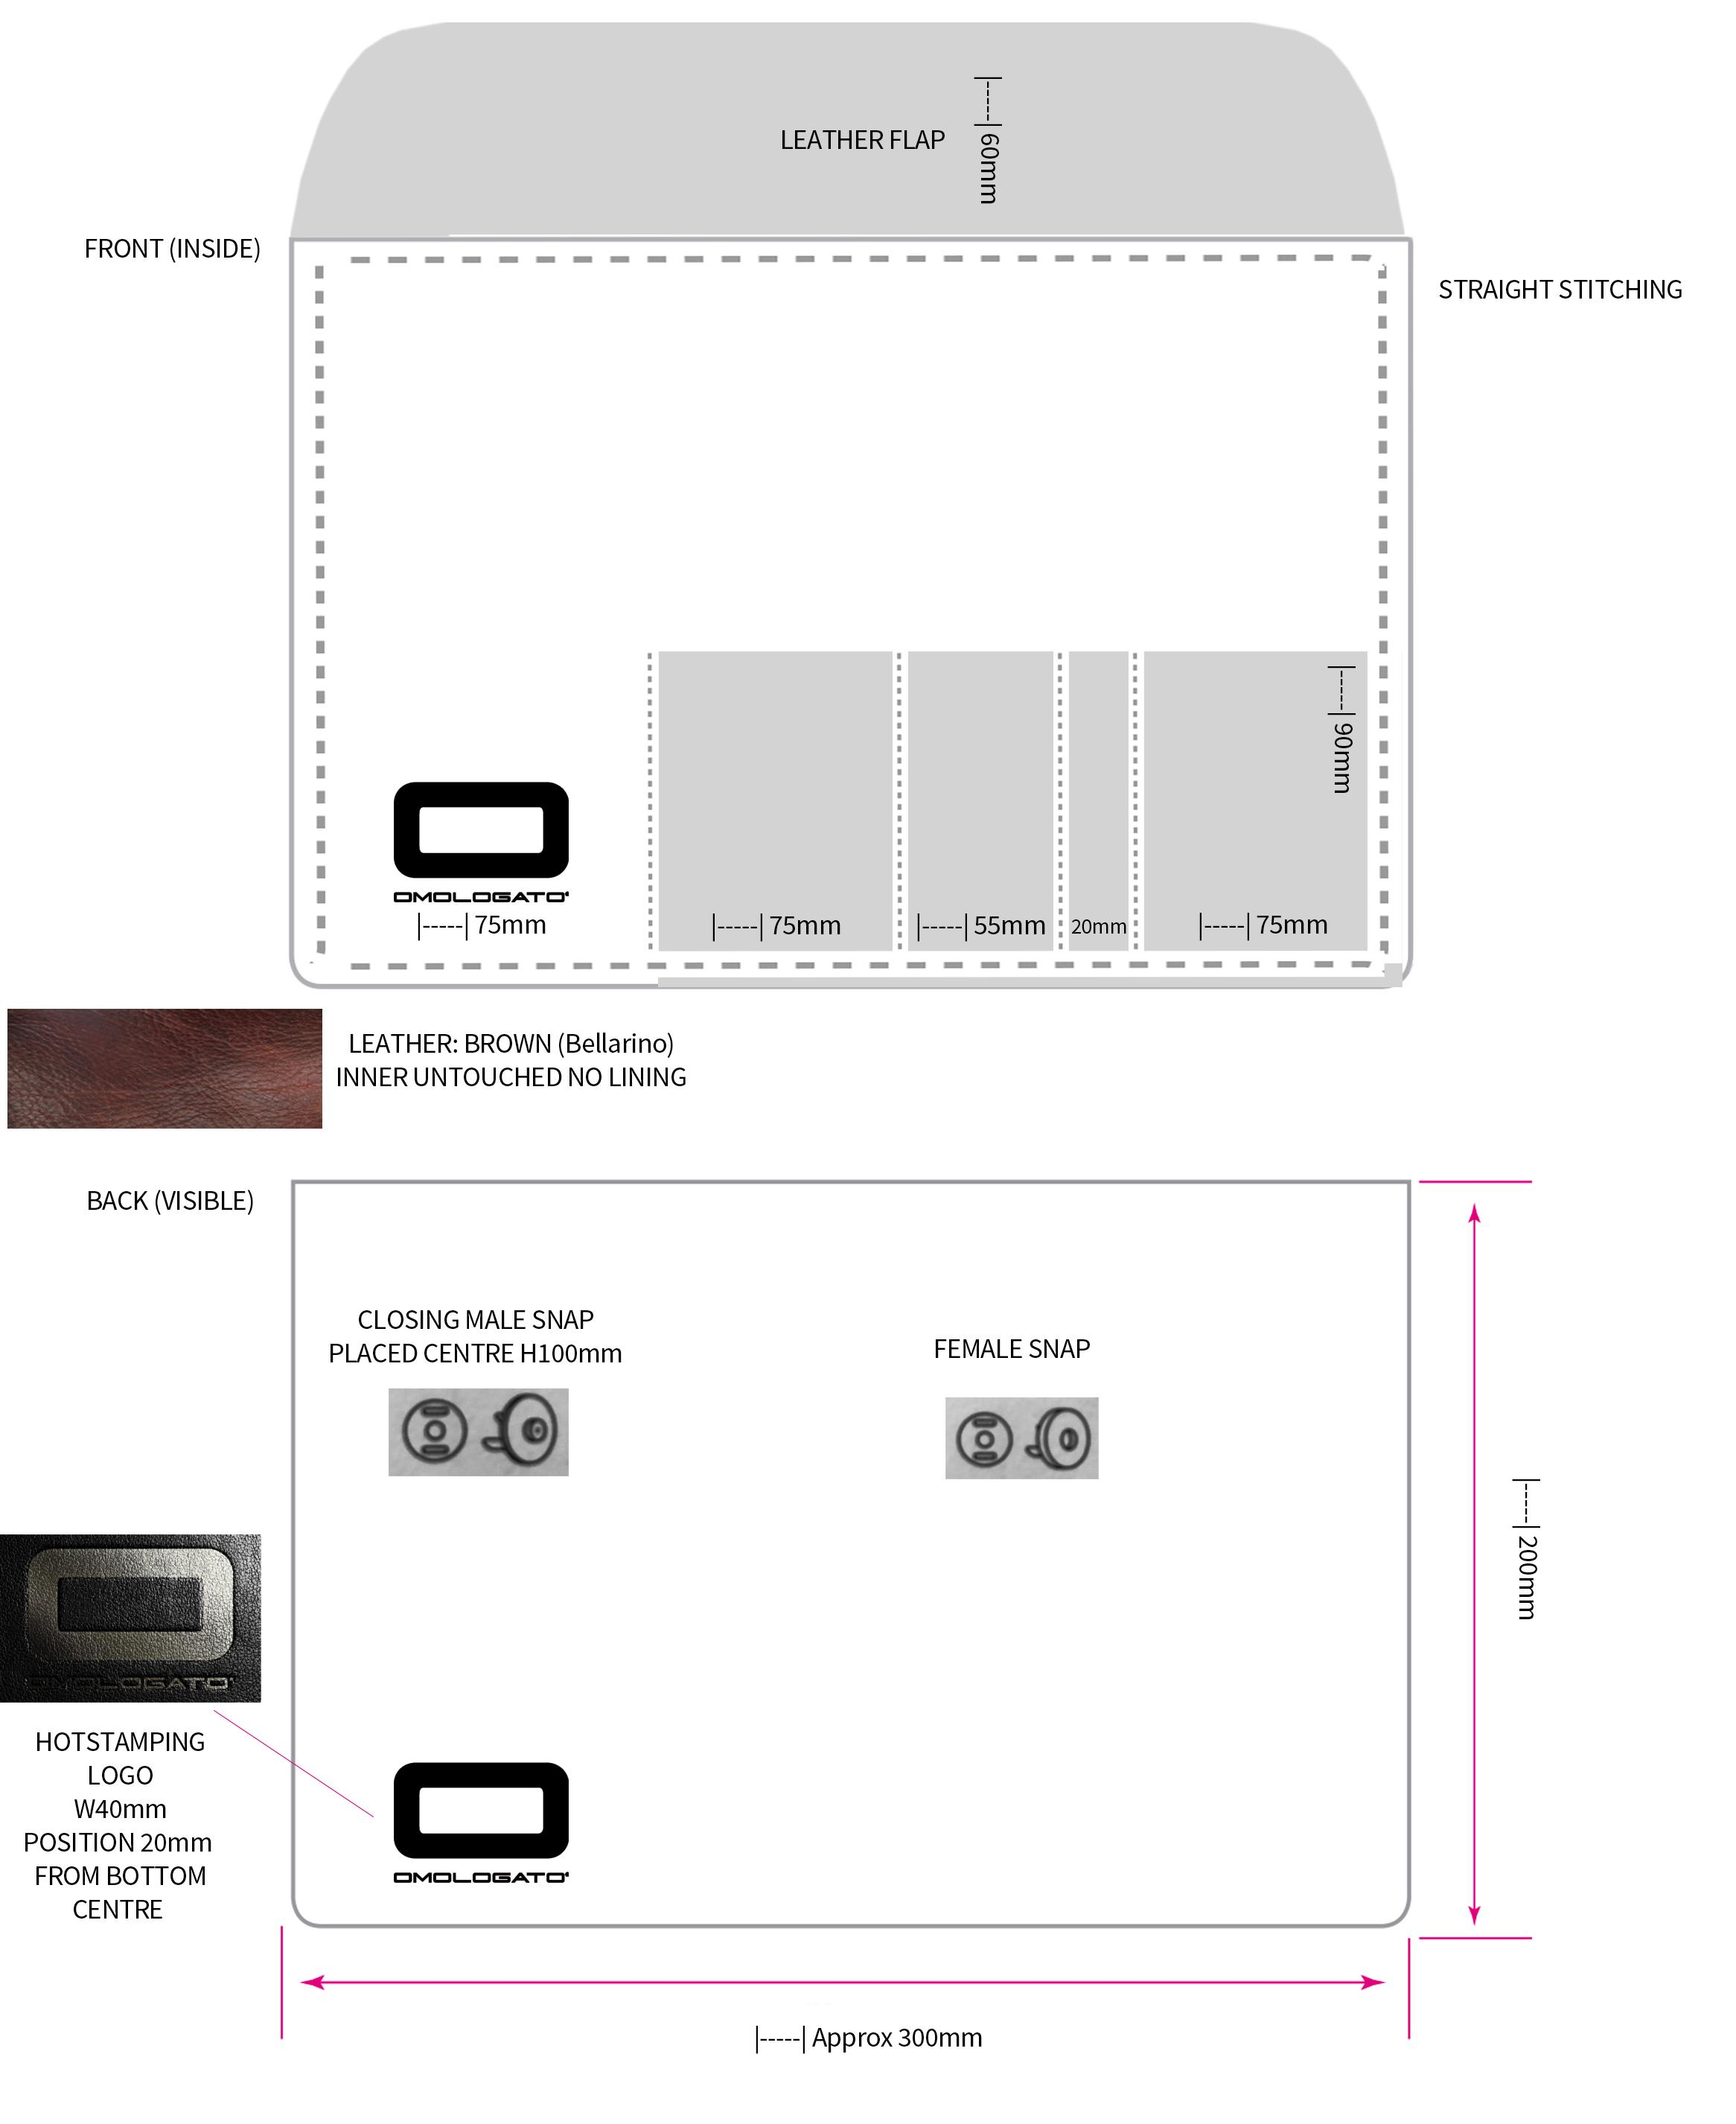 bb-omologato-watch-roll-2-design-sheet-draft.jpg